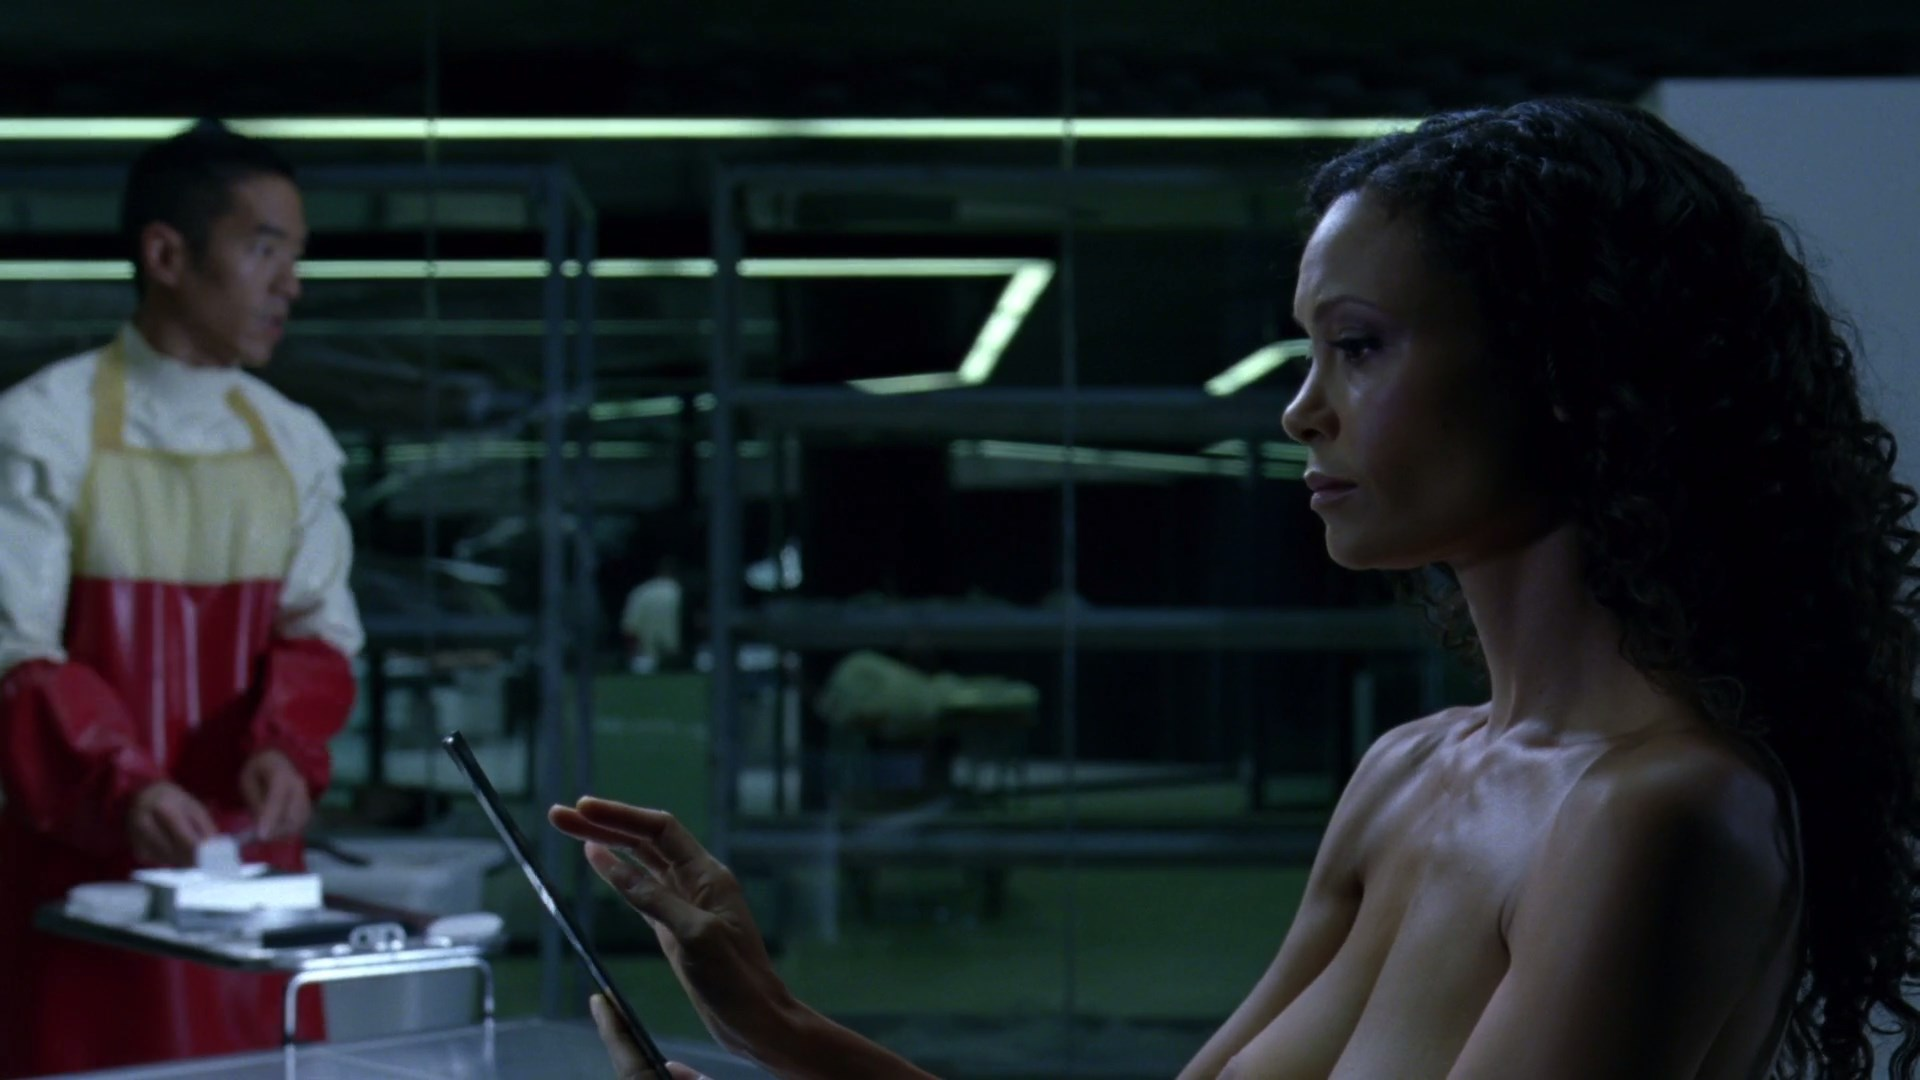 Movie Actress naked boobs